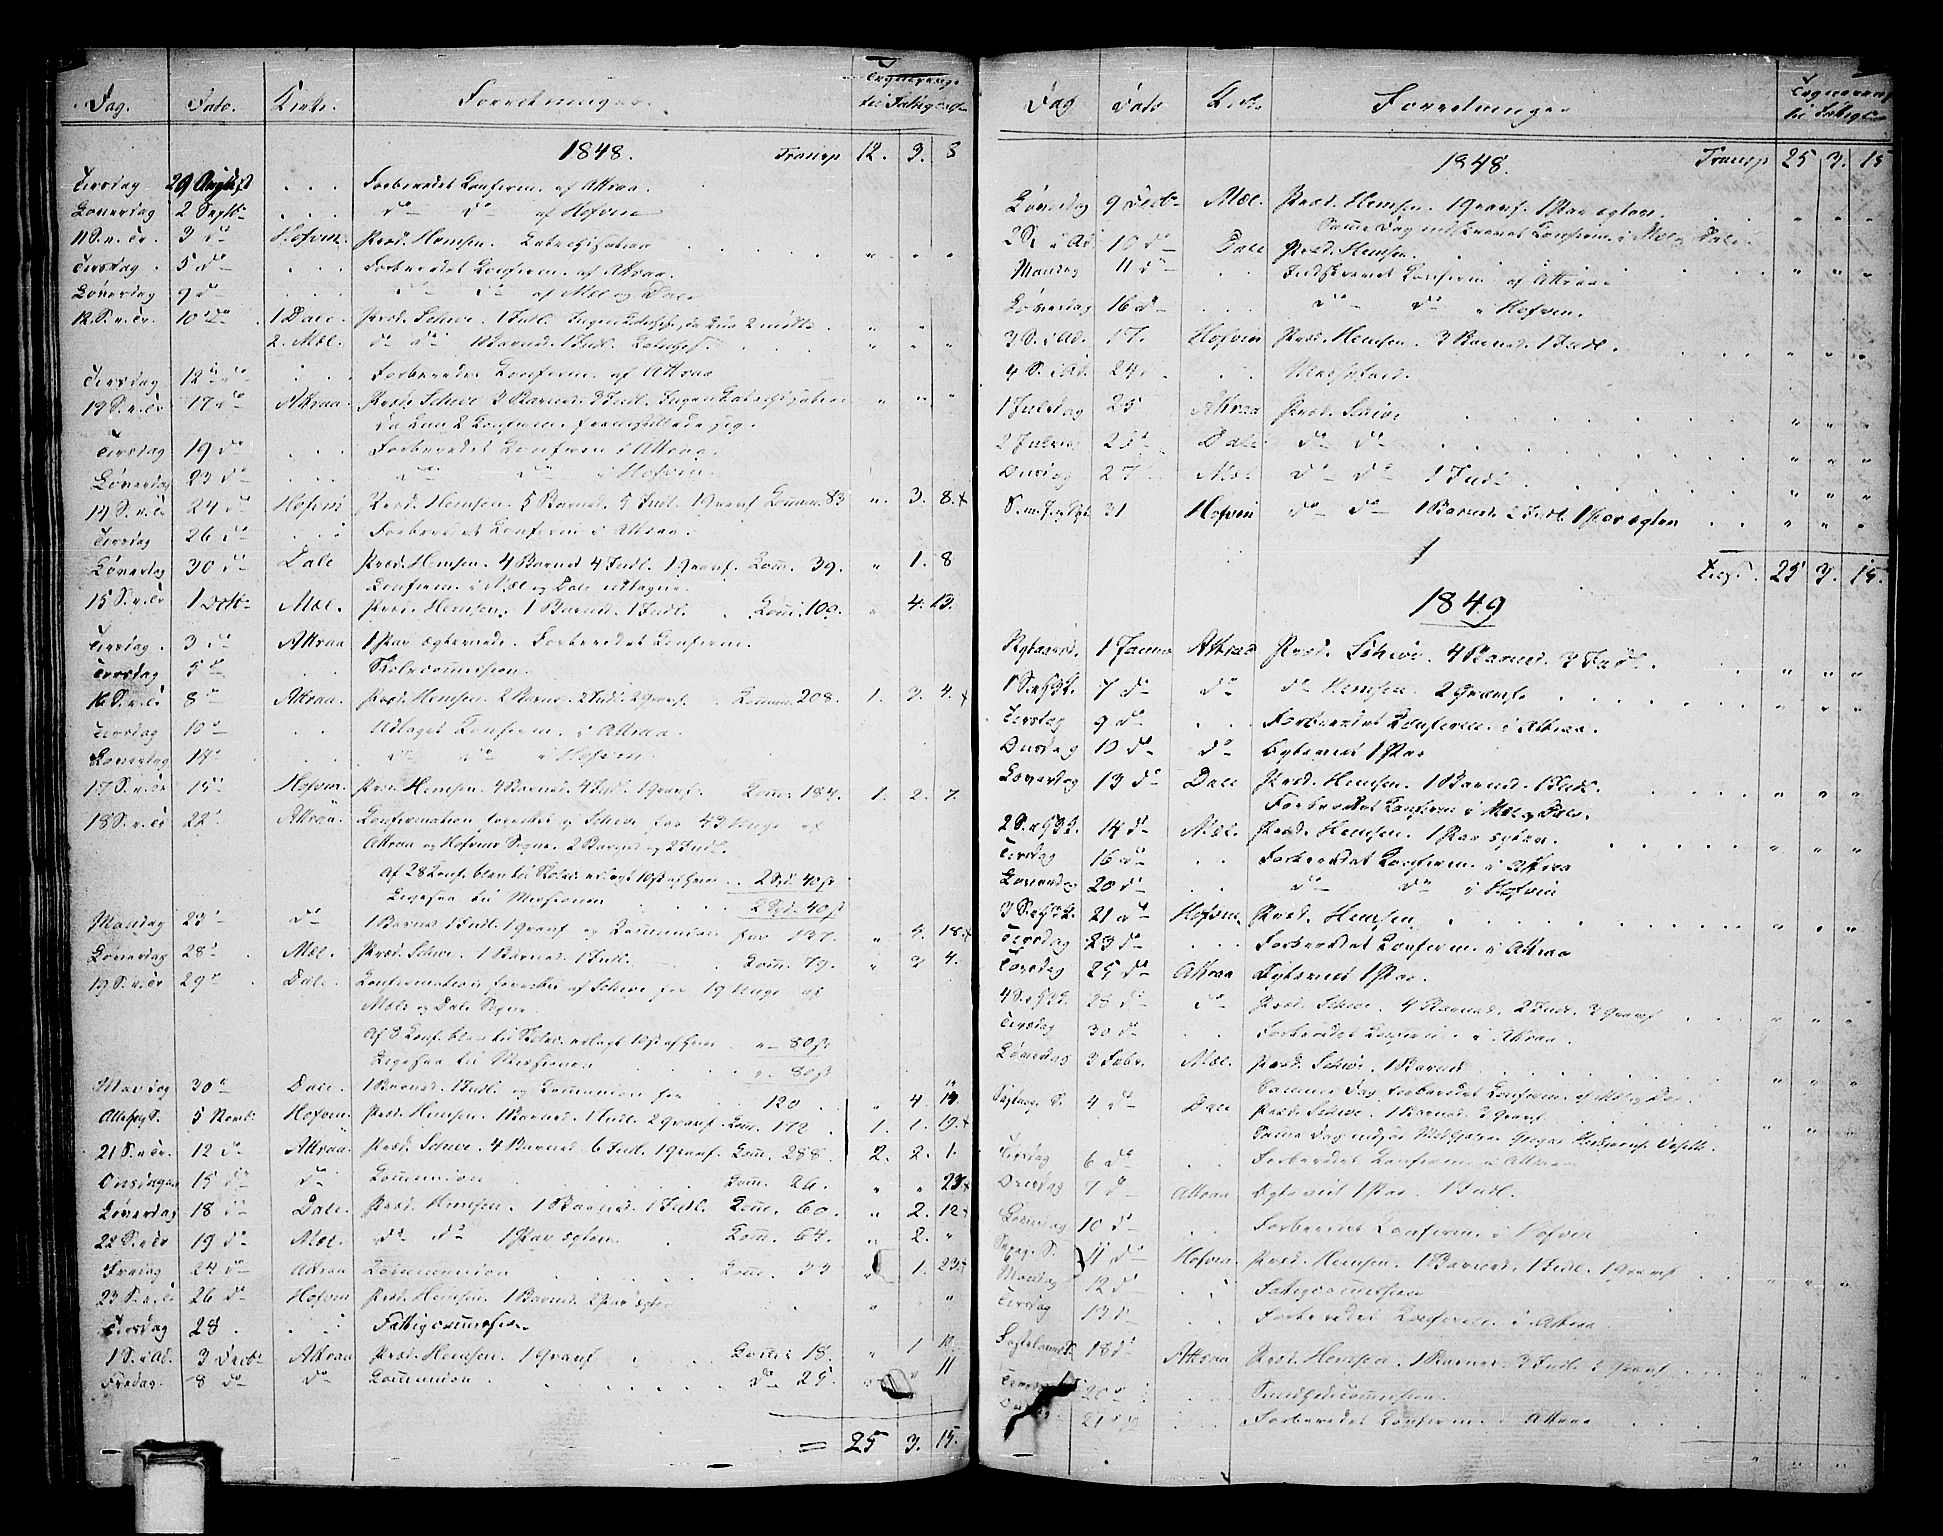 SAKO, Tinn kirkebøker, F/Fa/L0003: Ministerialbok nr. I 3, 1810-1814, s. 198-199